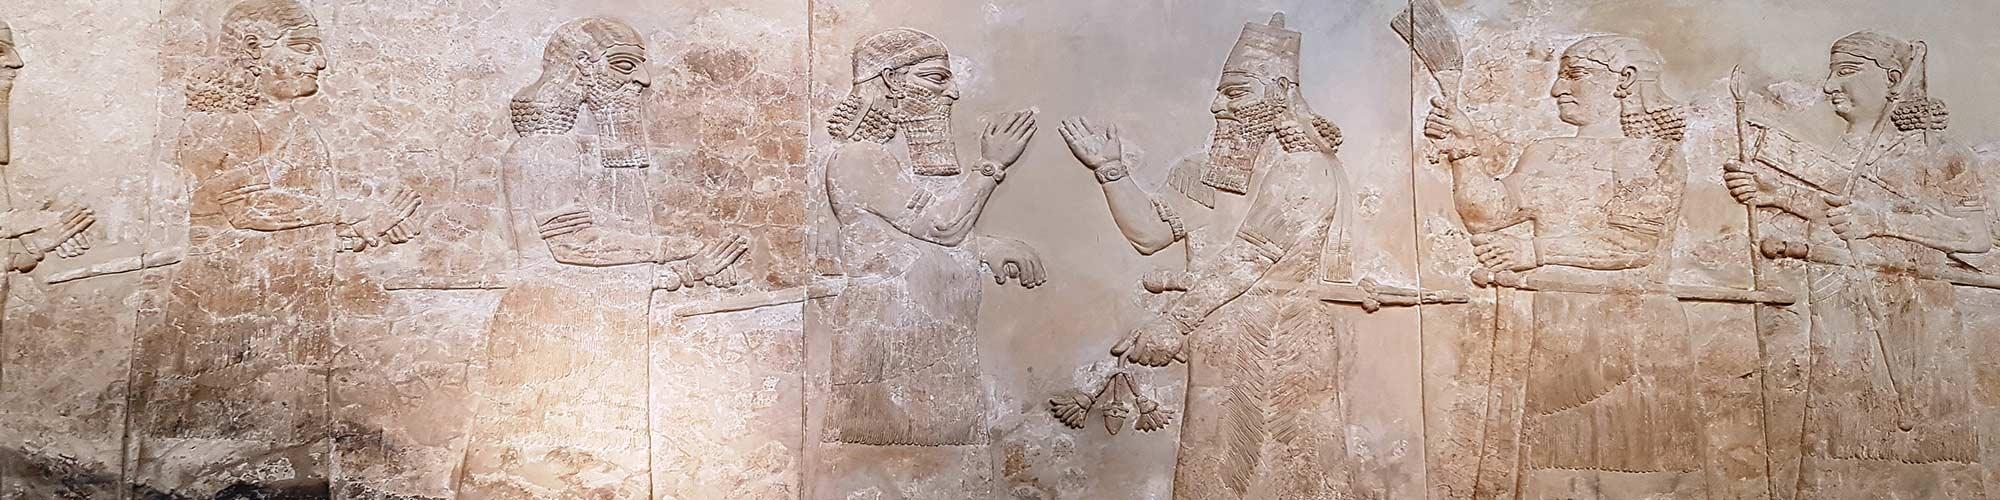 Museo de Bagdad- El Pais Viajes